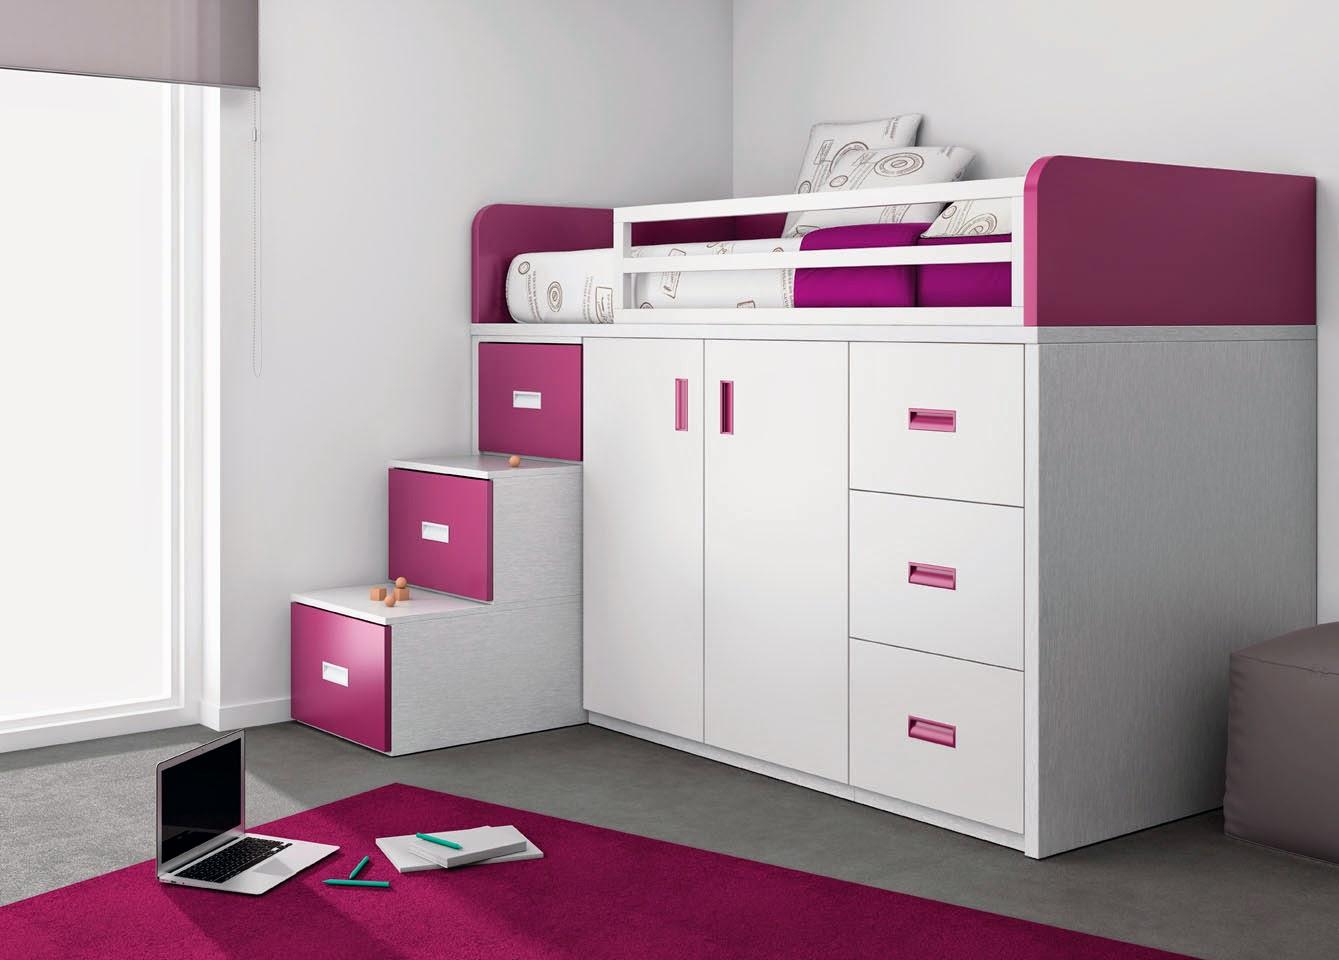 Camerette piccole soluzioni salvaspazio mobili ros for Camas dos en una